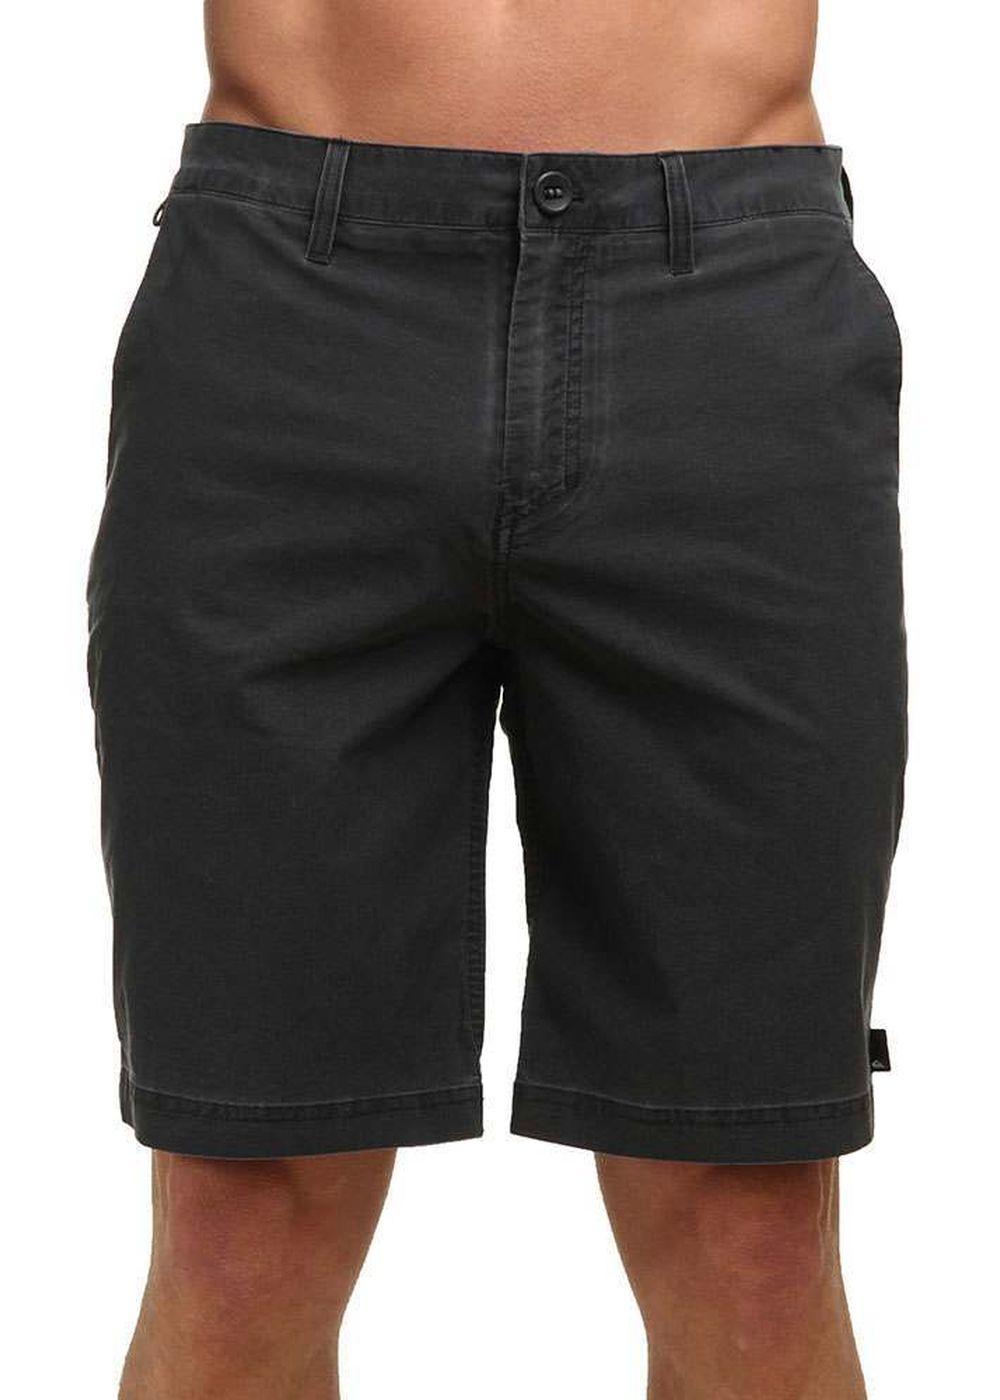 quiksilver-washed-amphibian-shorts-black